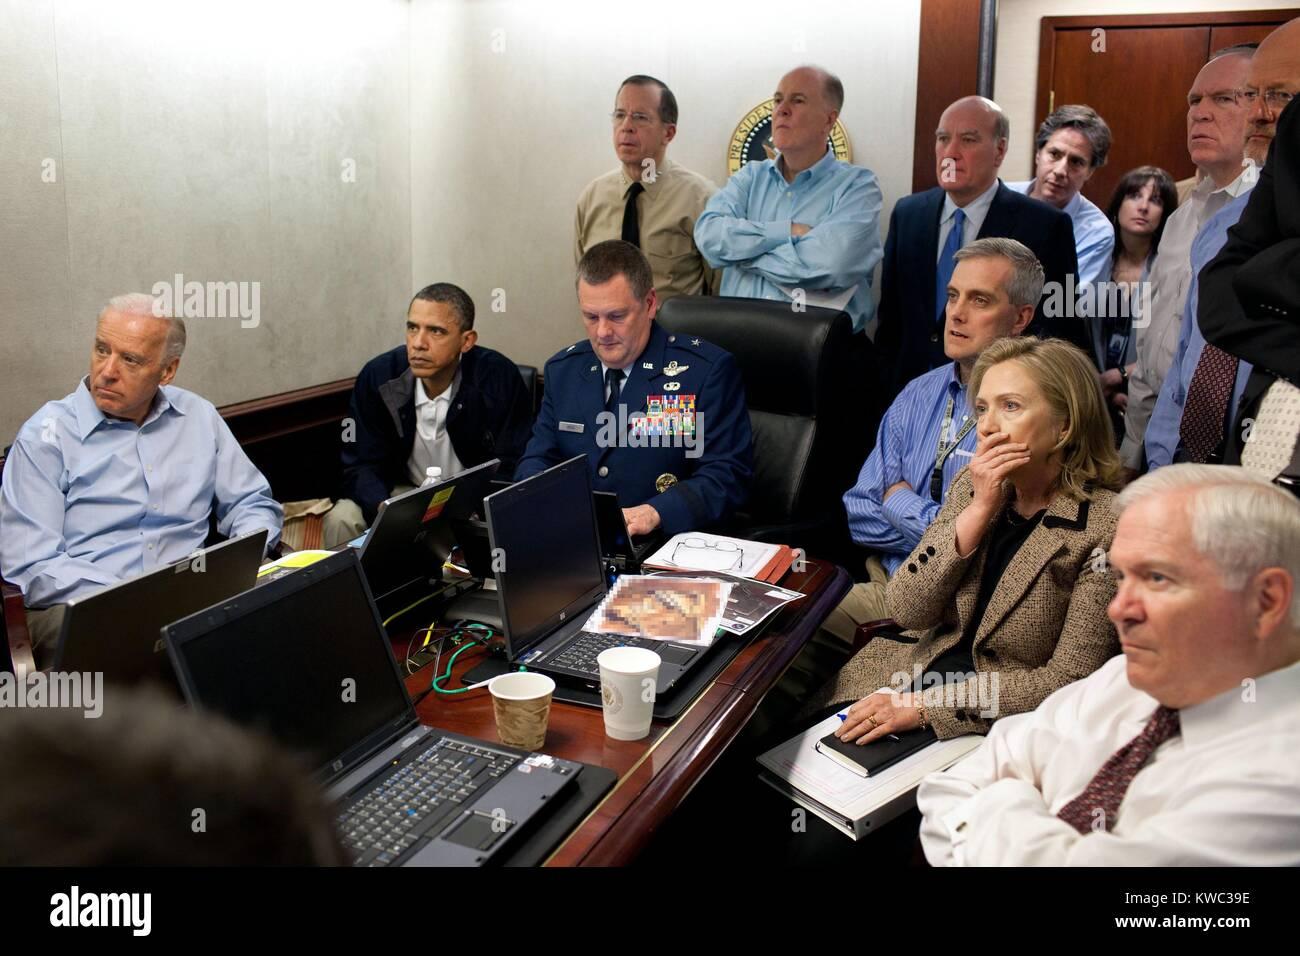 'Operation Neptune's Spear,' the mission against Osama bin Laden, May 1, 2011. President Obama, VP Biden - Stock Image